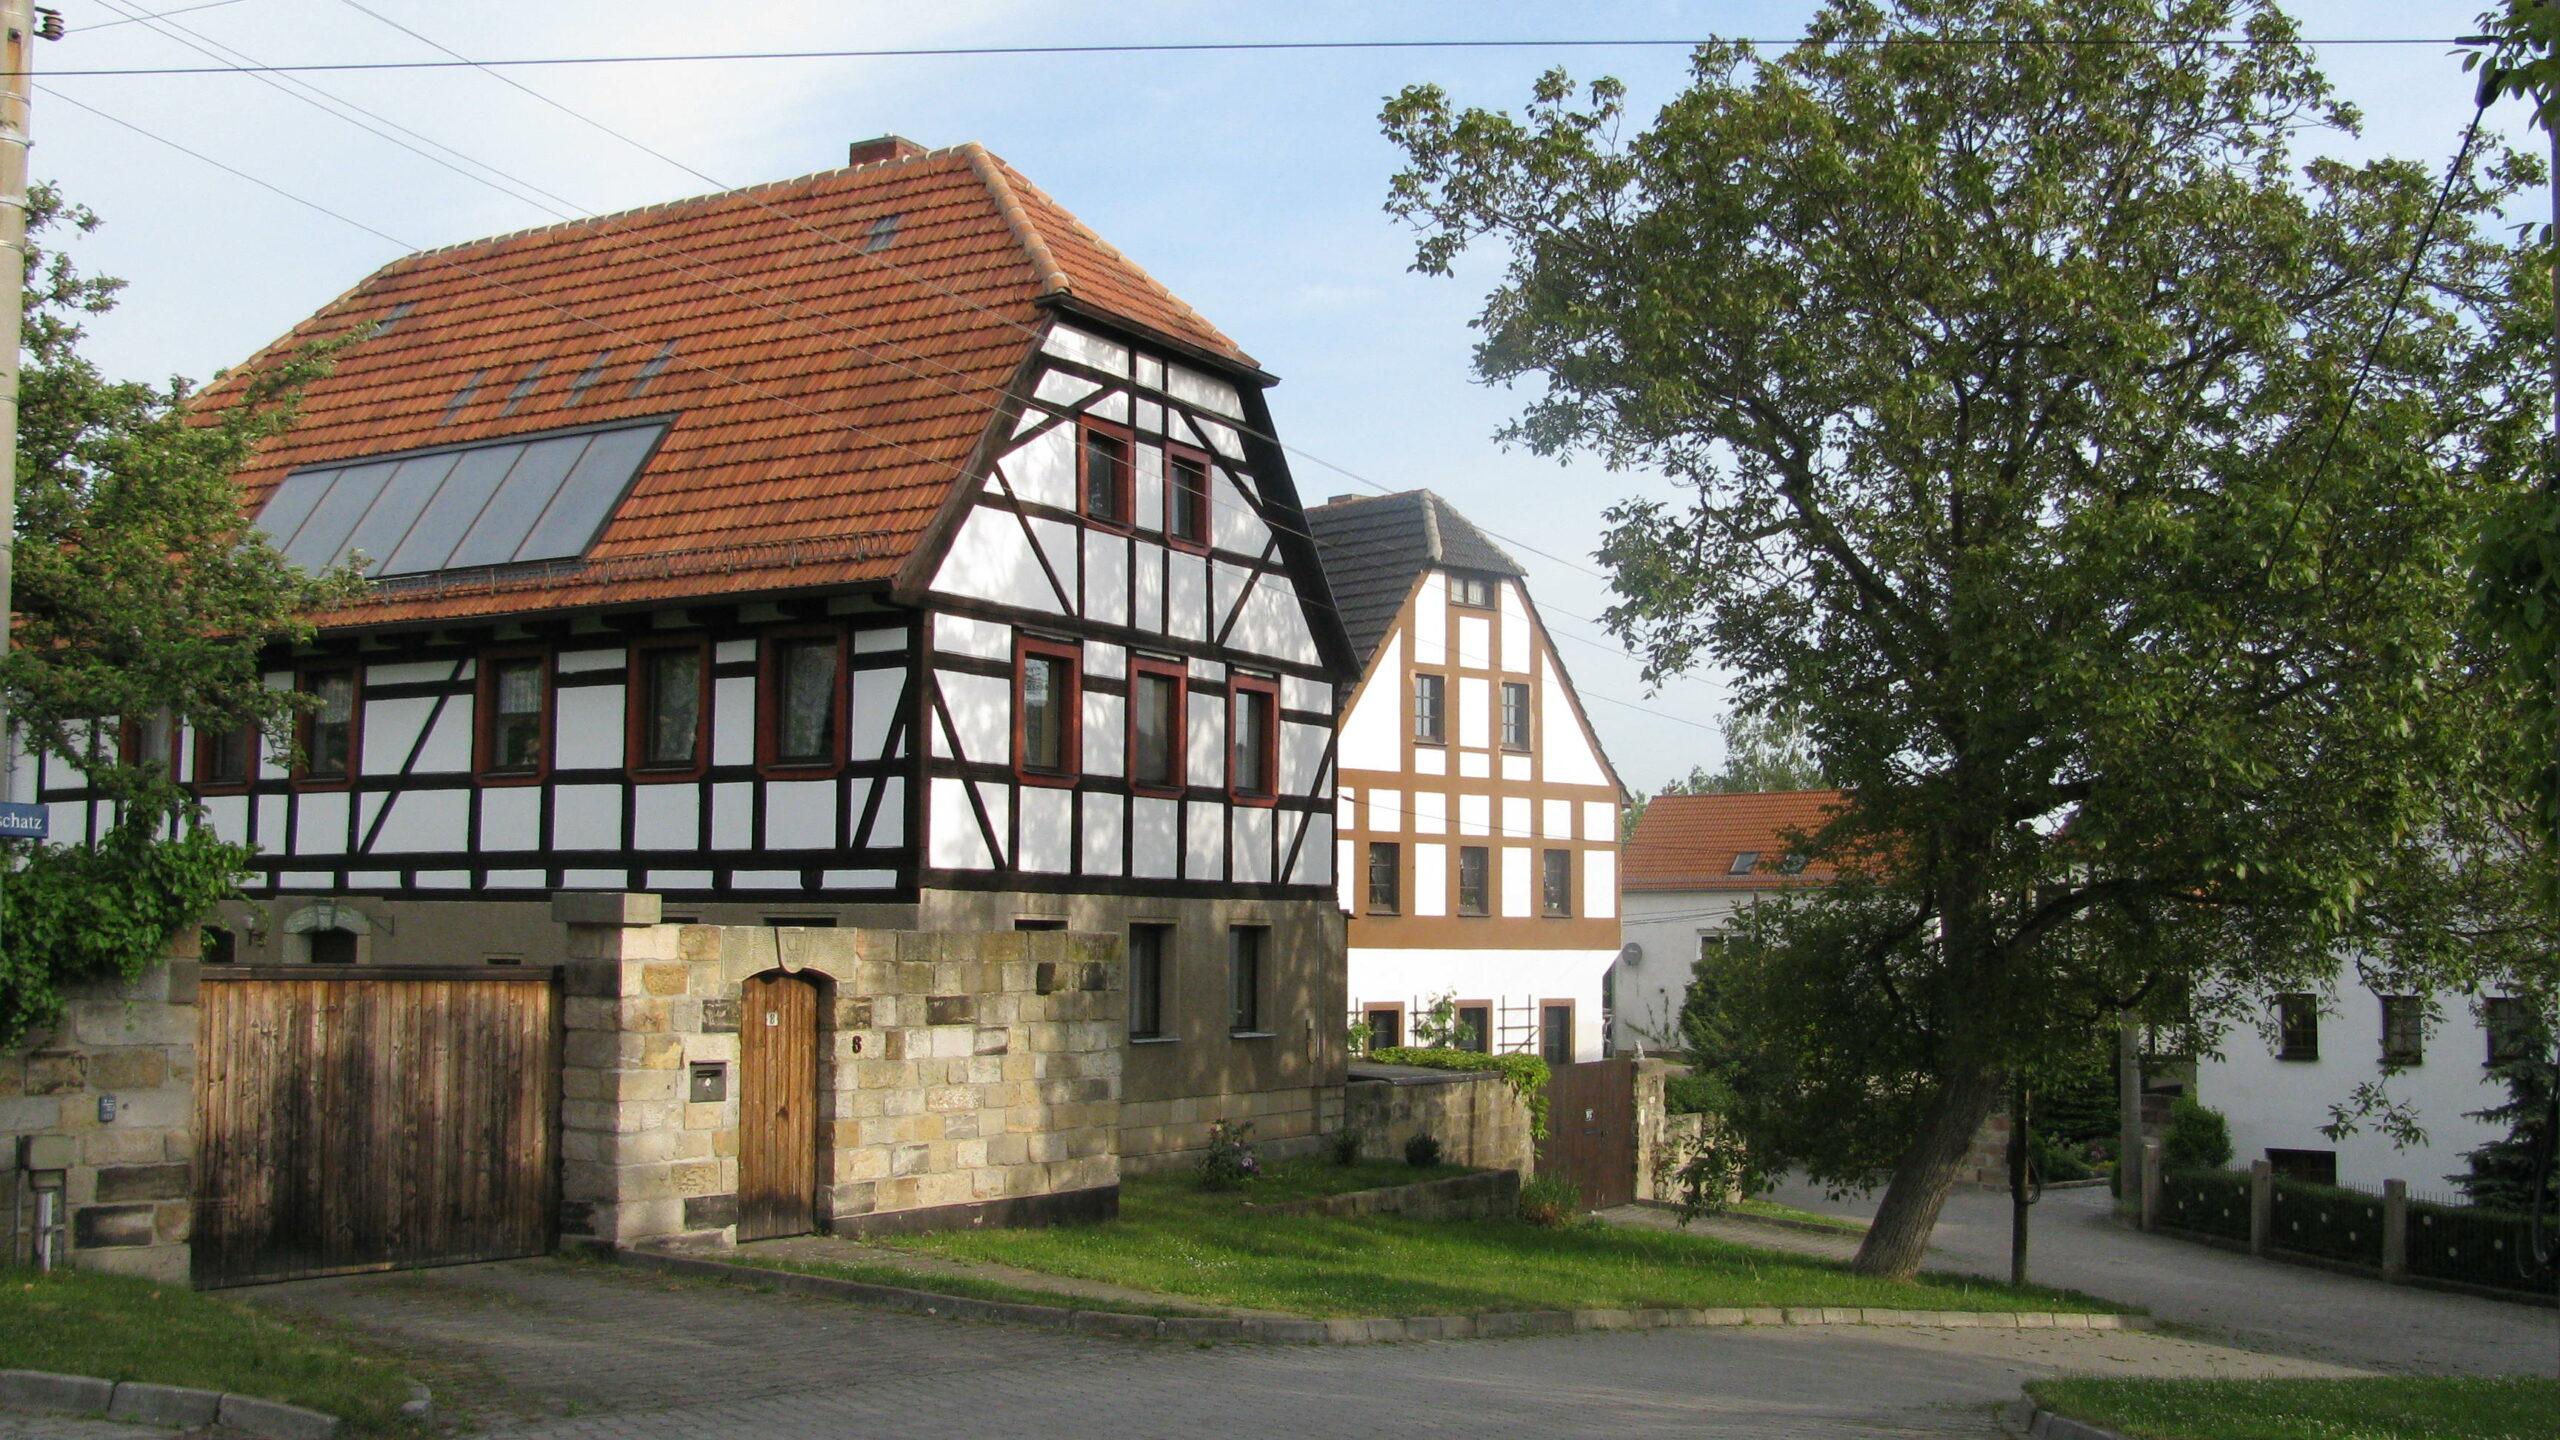 Mobschatz